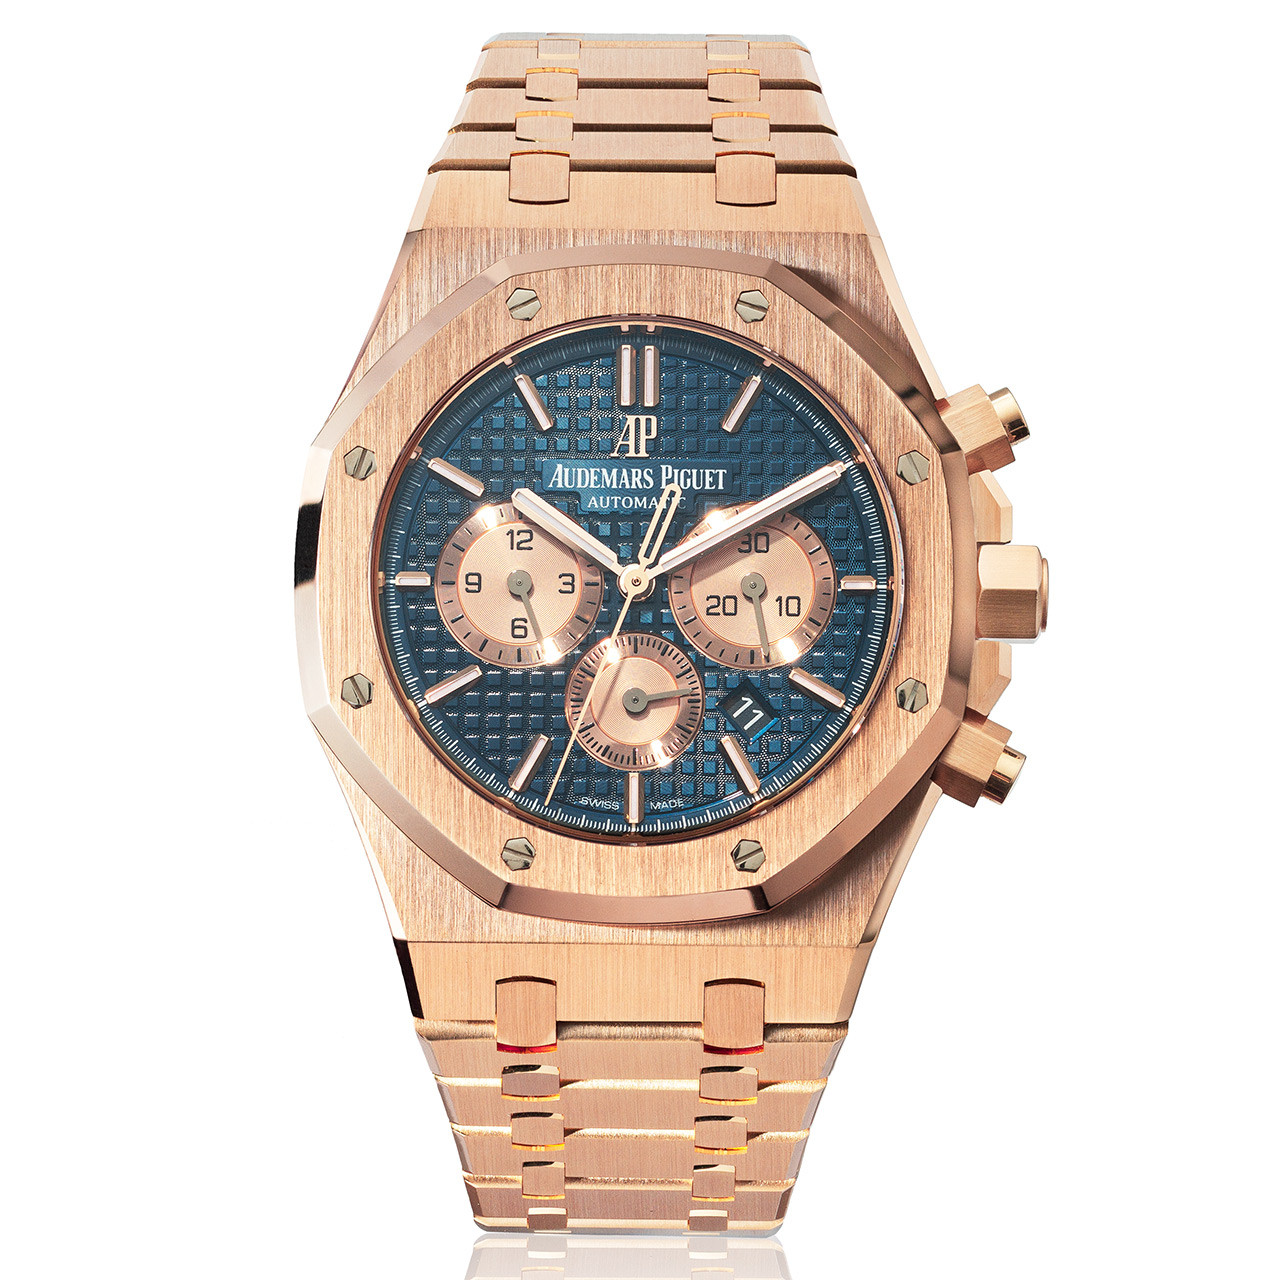 b67d99c09d2c Audemars piguet royal oak chronograph automatic mens watch shyne jewelers  jpg 1280x1280 Oak watch